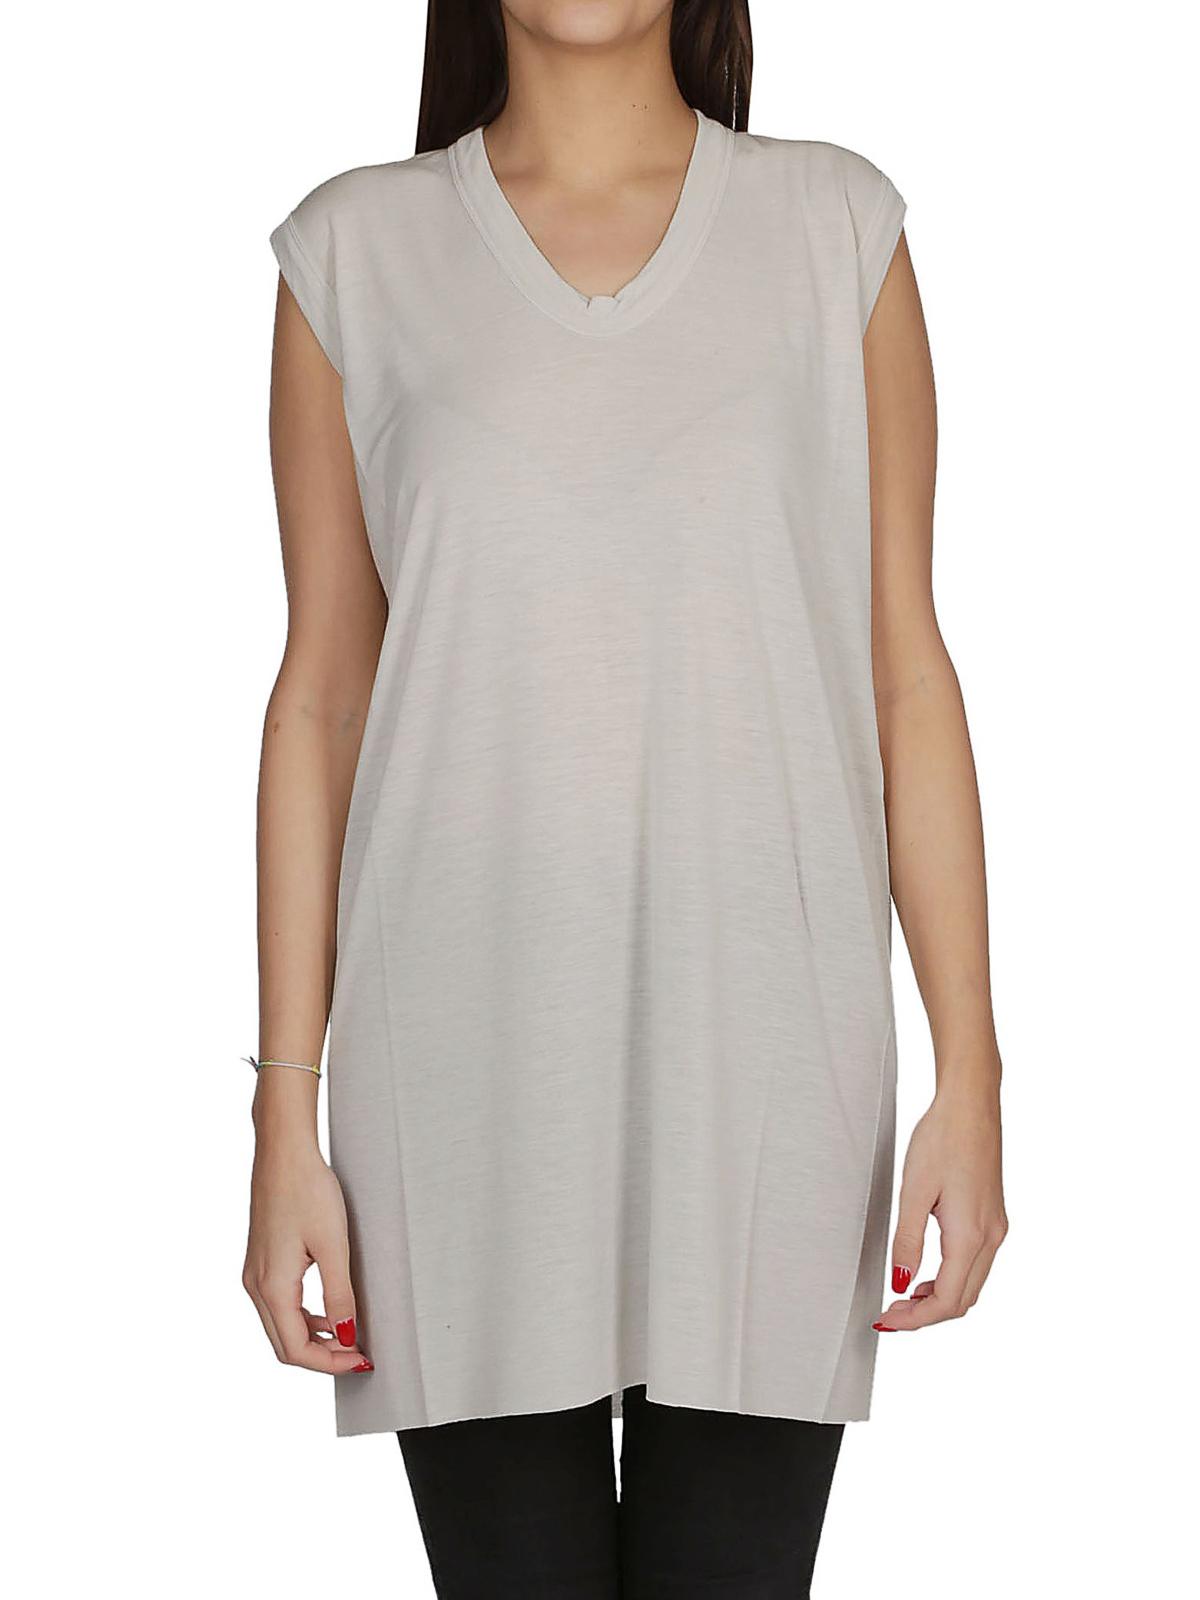 2df71854ef iKRIX RICK OWENS HUN: Tops & Tank tops - V-neck white silk blend